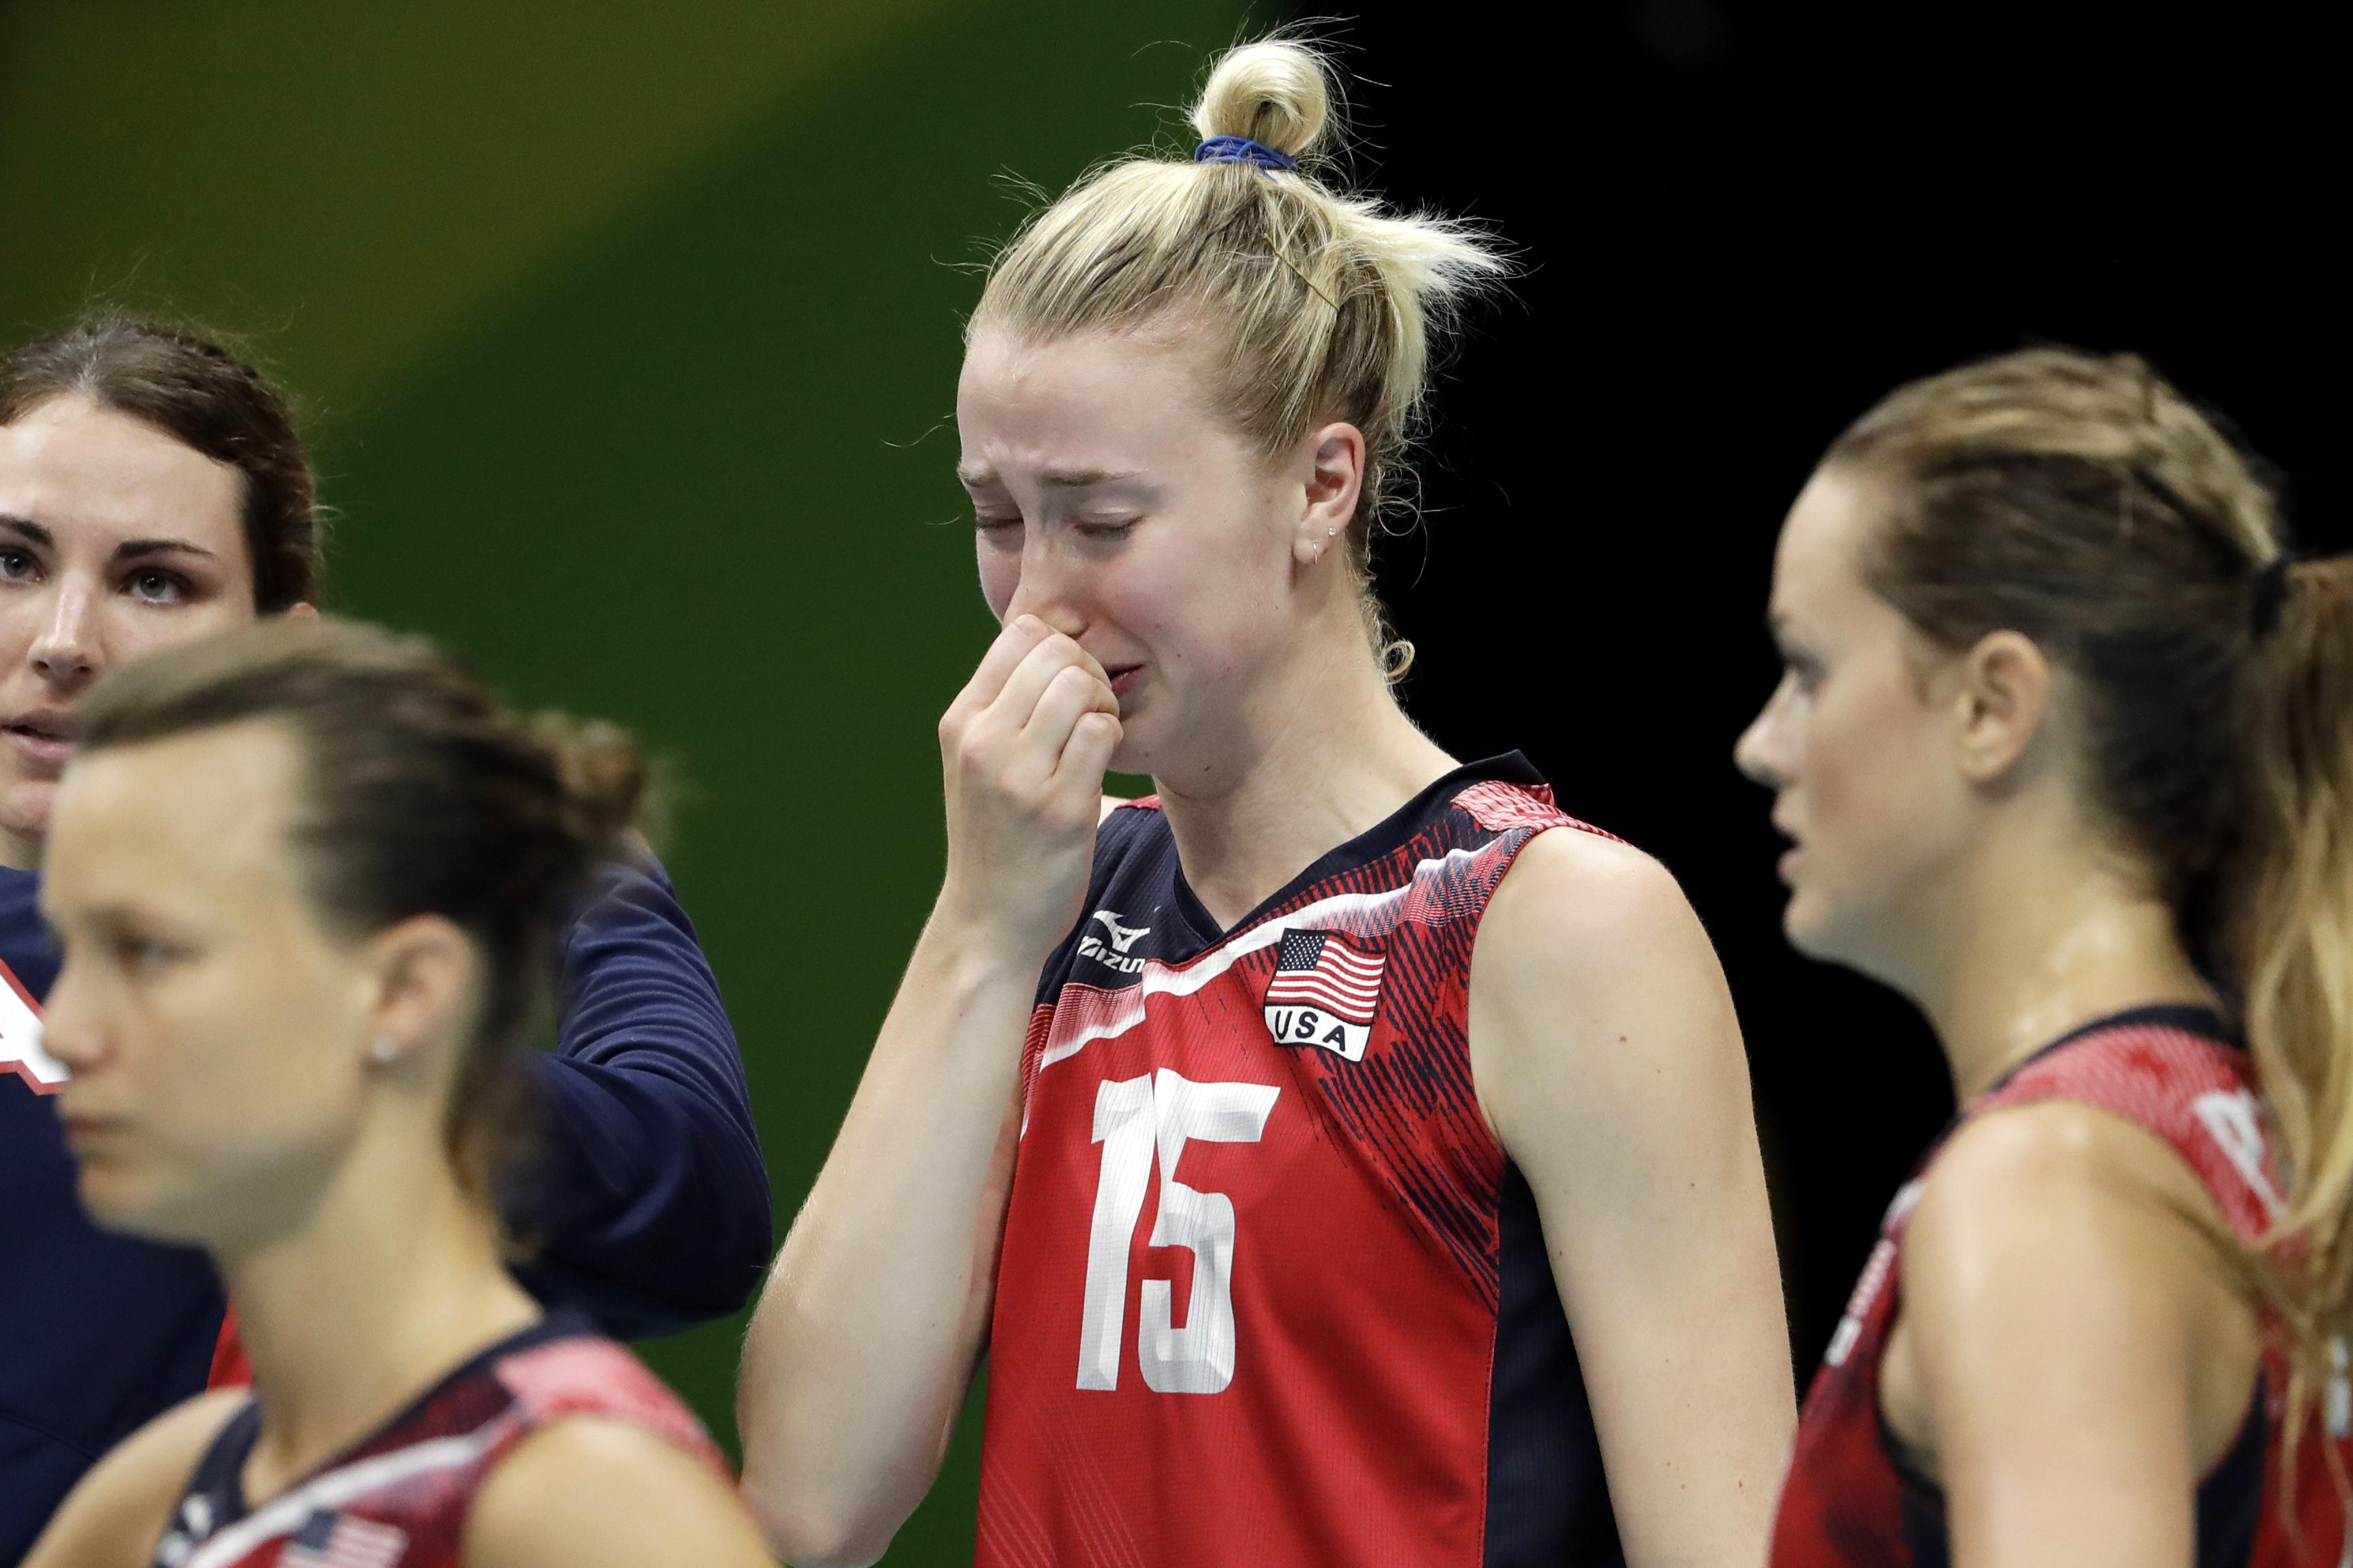 Rio_Olympics_Volleyball_Women.JPEG-81a35.jpg